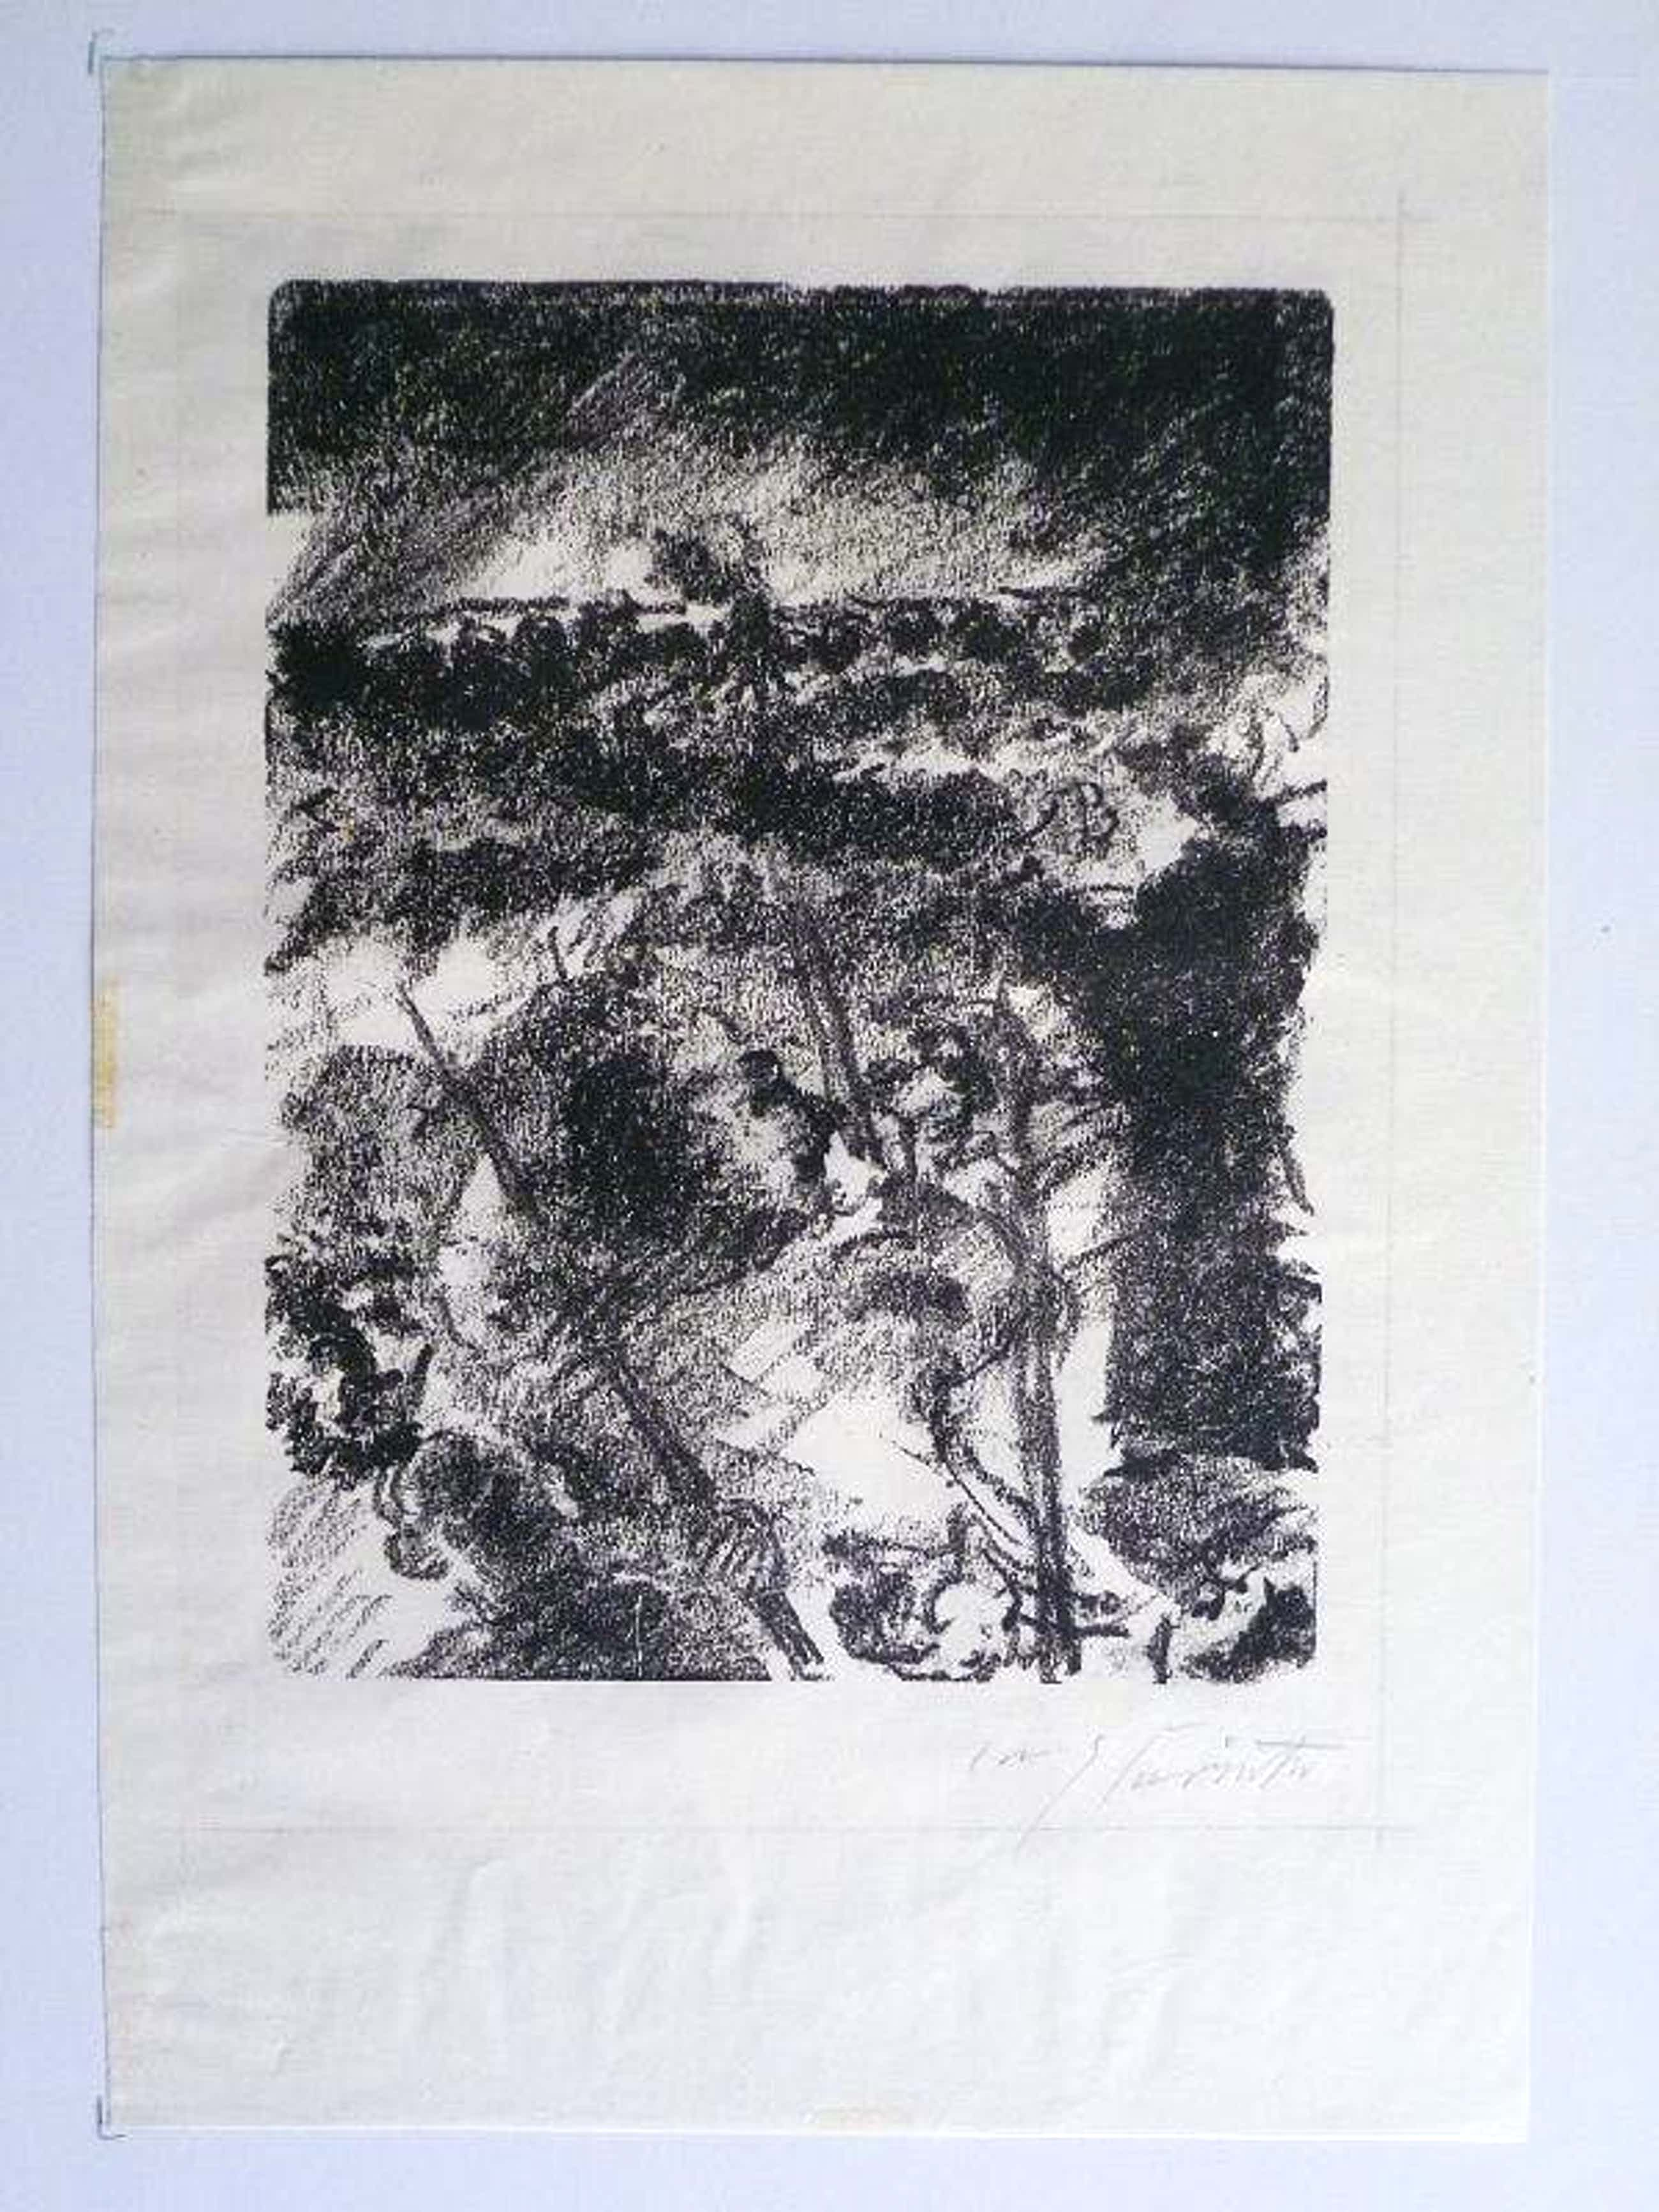 Lovis Corinth - Mizpas Opfer signierte Lithographie 1923 kopen? Bied vanaf 110!